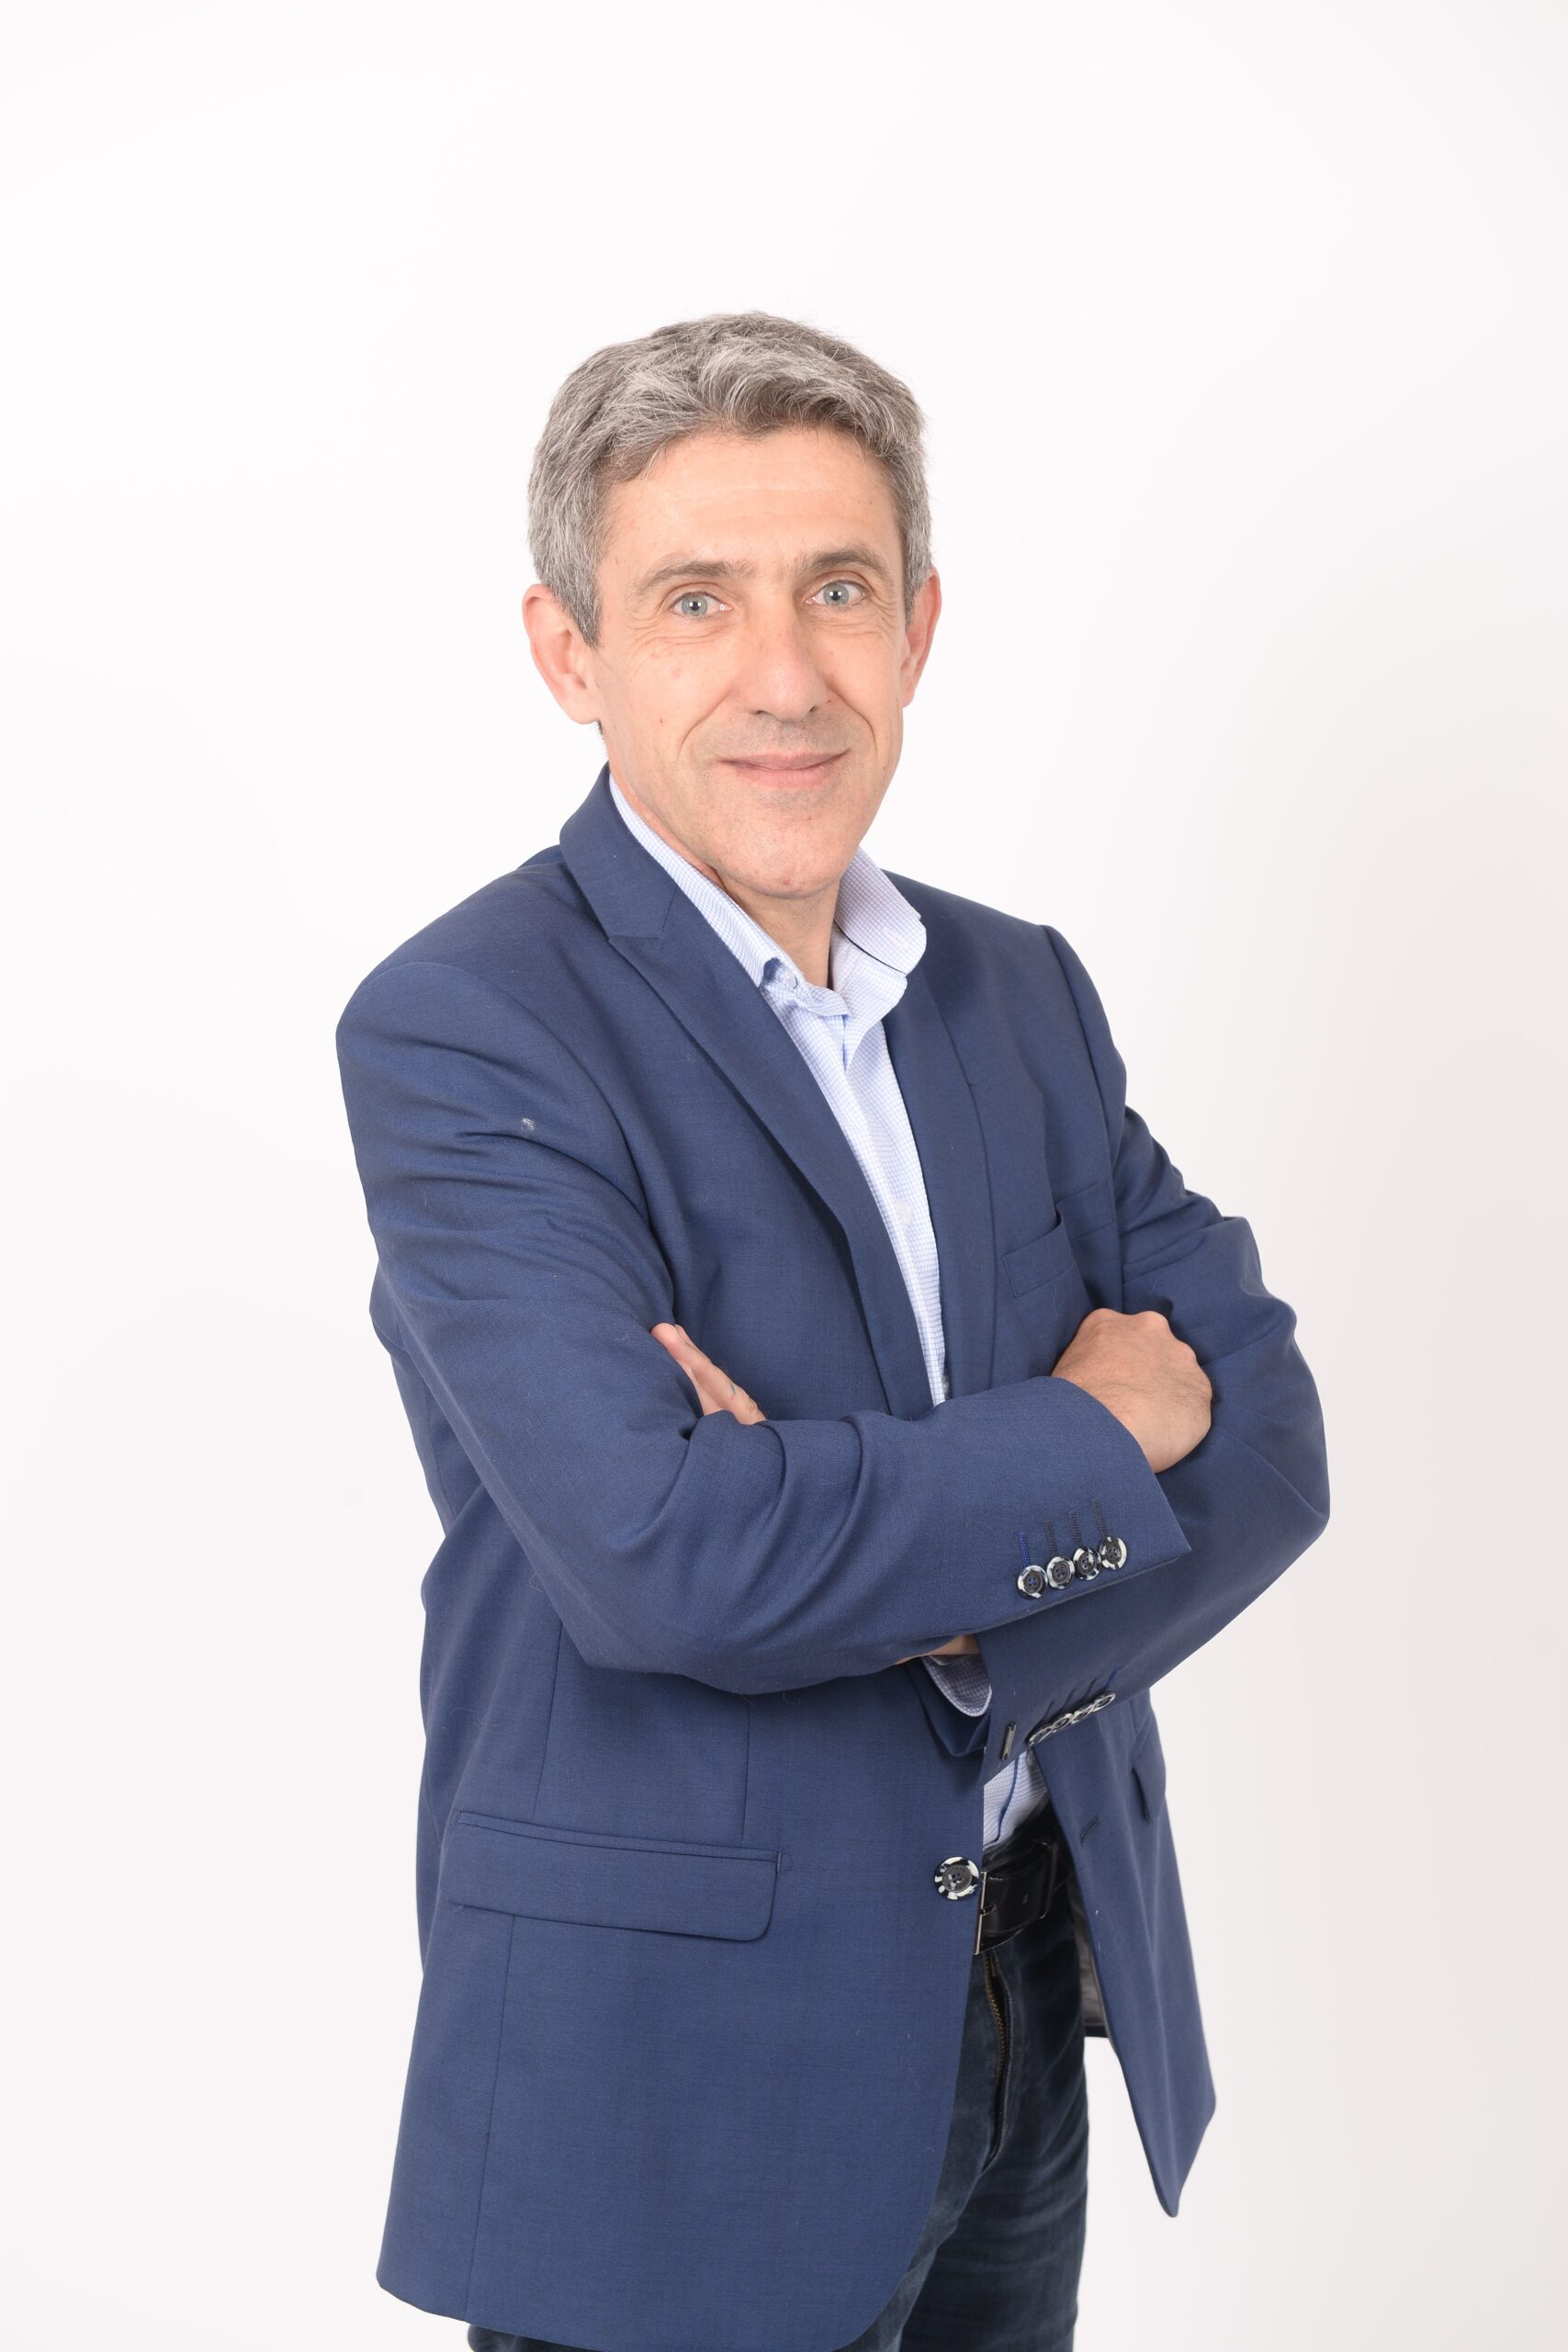 Philippe RAYNAUD